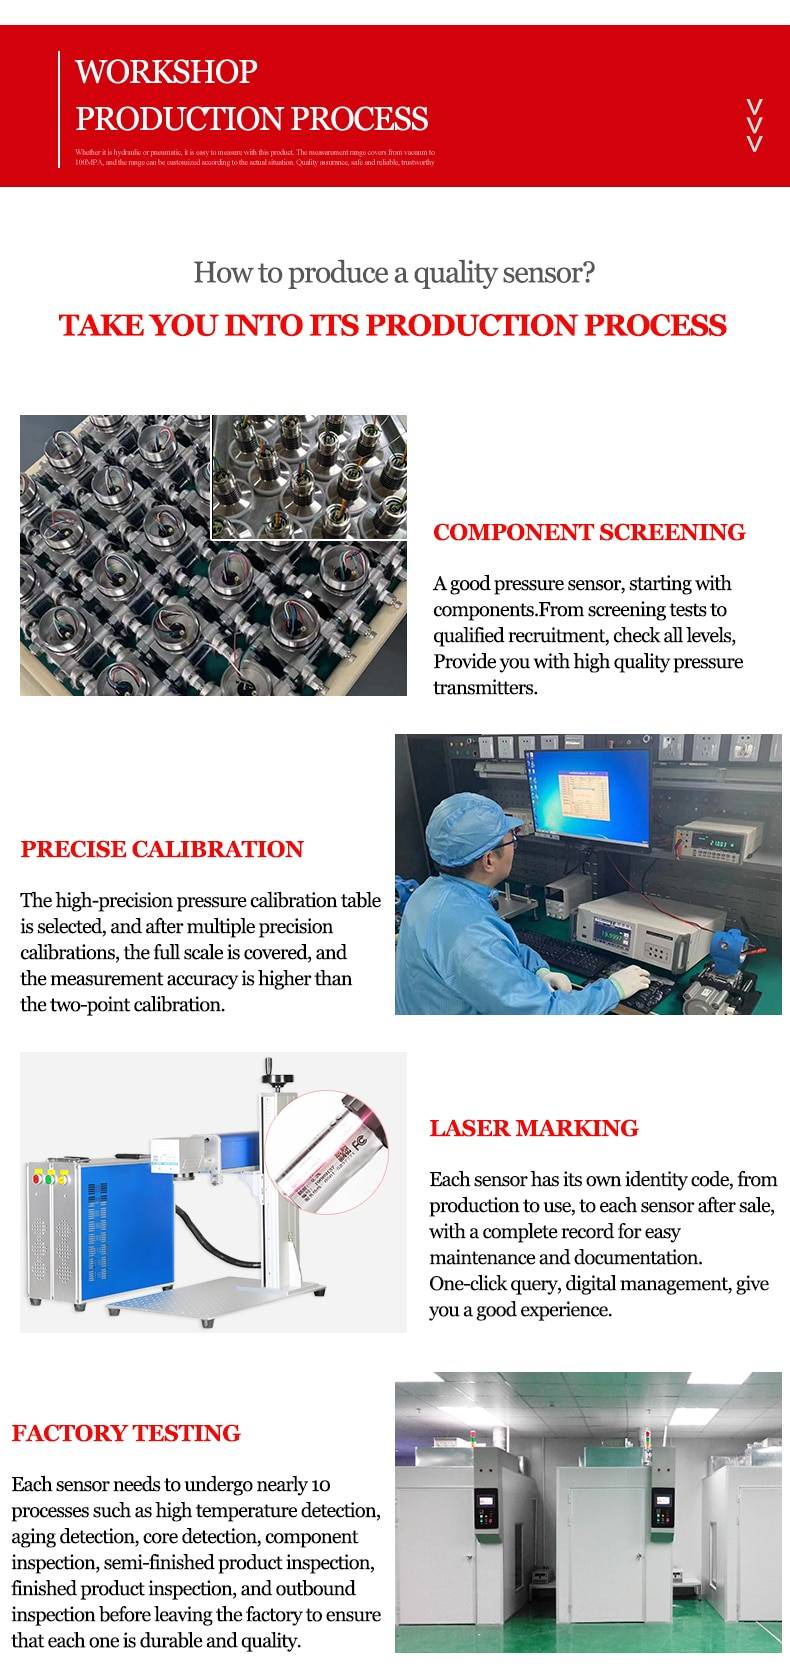 Waterproof 12V G1/2 Pressure Sensor Transmitter Pressure Transducer 1.2 MPa For Water Gas Oil